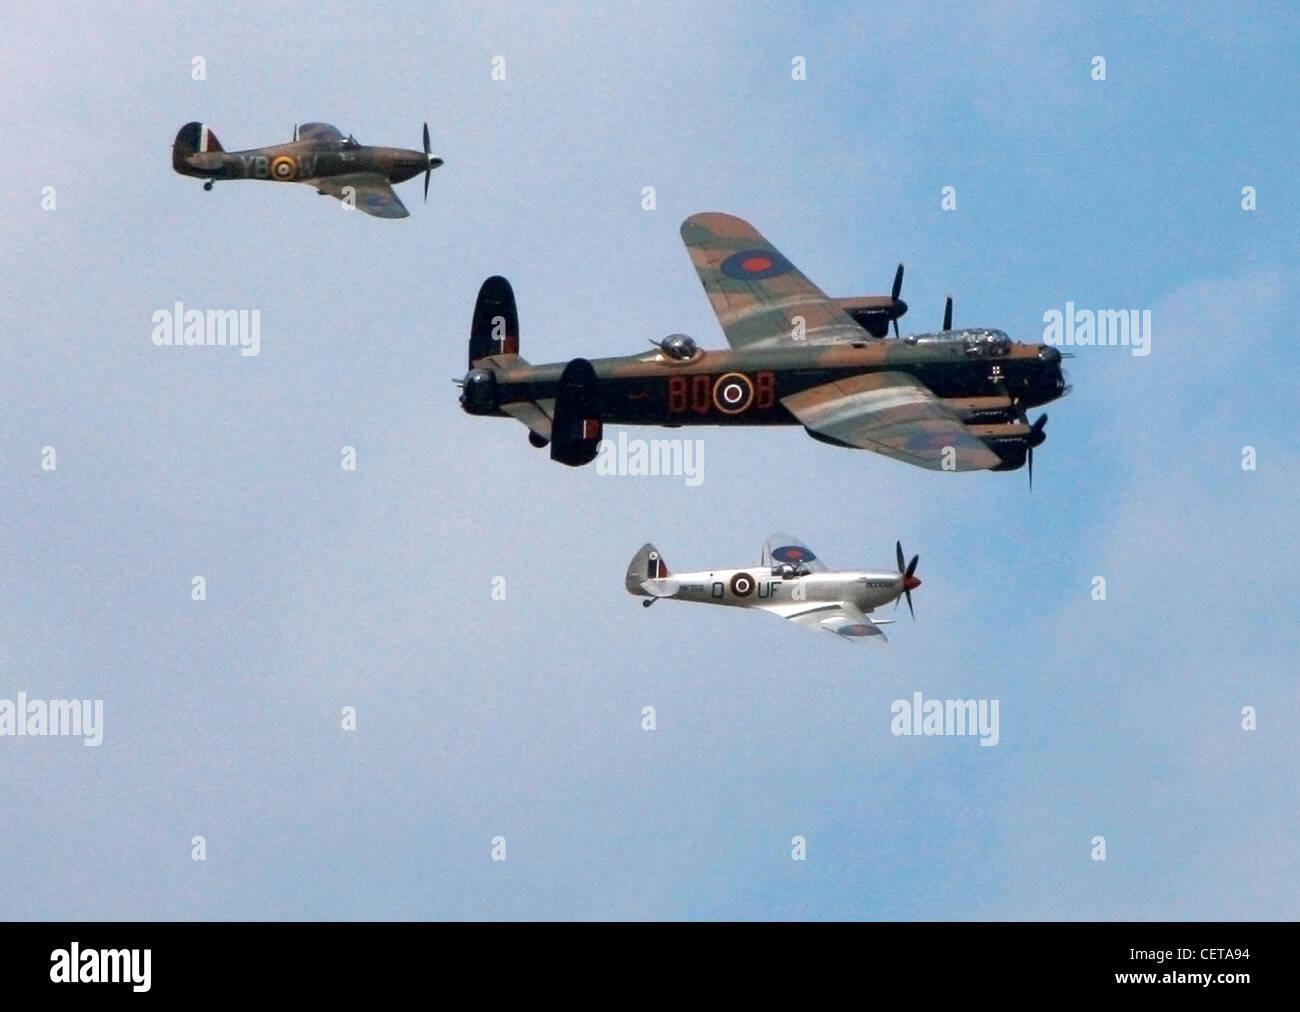 Kampfflugzeuge im Luftbild Display beim Goodwood Revival. Stockbild